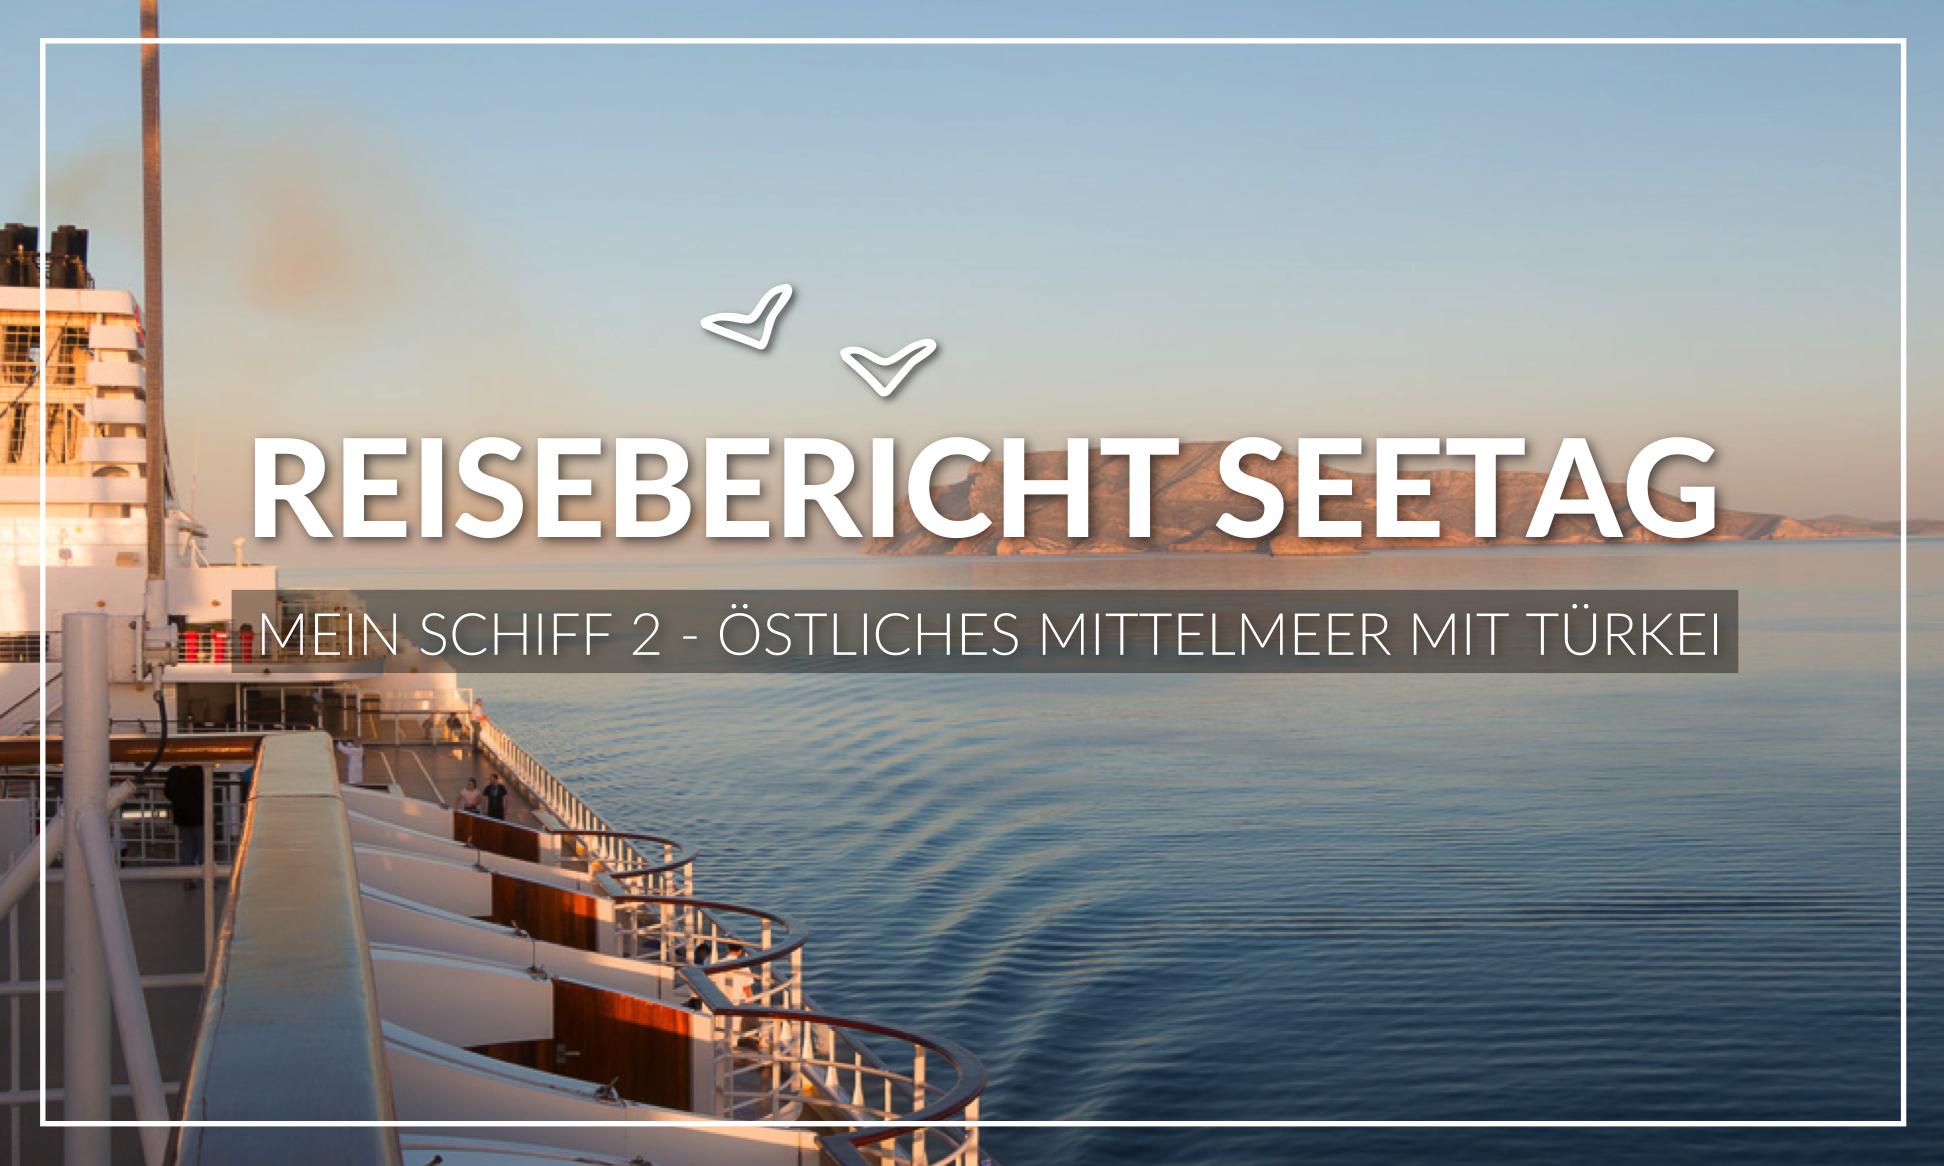 Mein Schiff Reisebericht Seetag